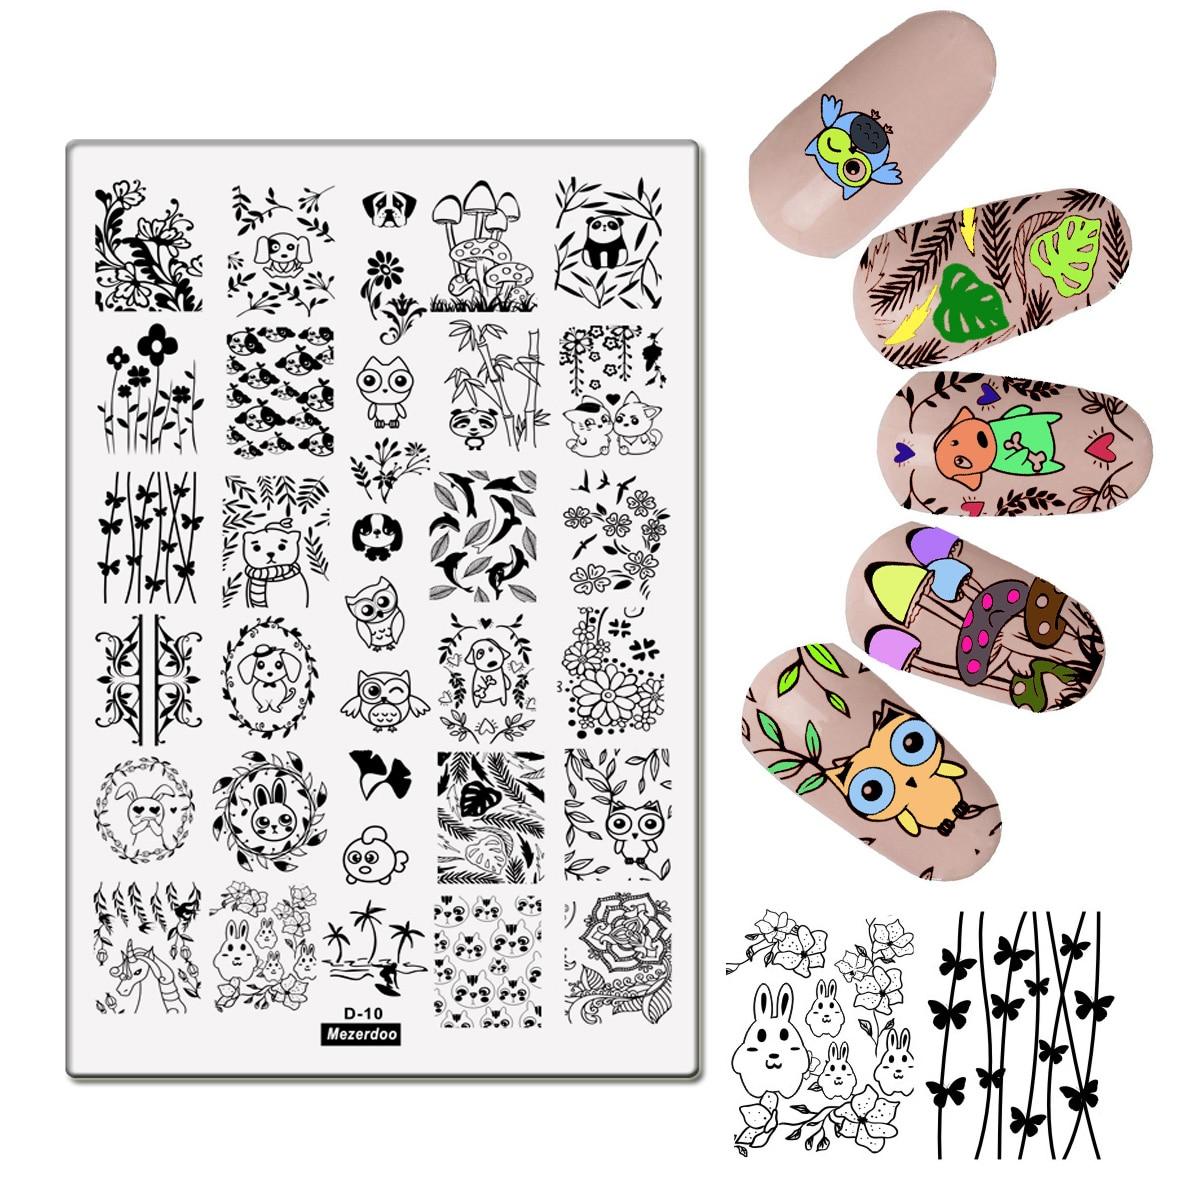 Cute Stamping Plates Unicorn Cartoon Nail Art Stamp Stamping Template Image Plates Wonderful Animal World Nail Stencil Tools